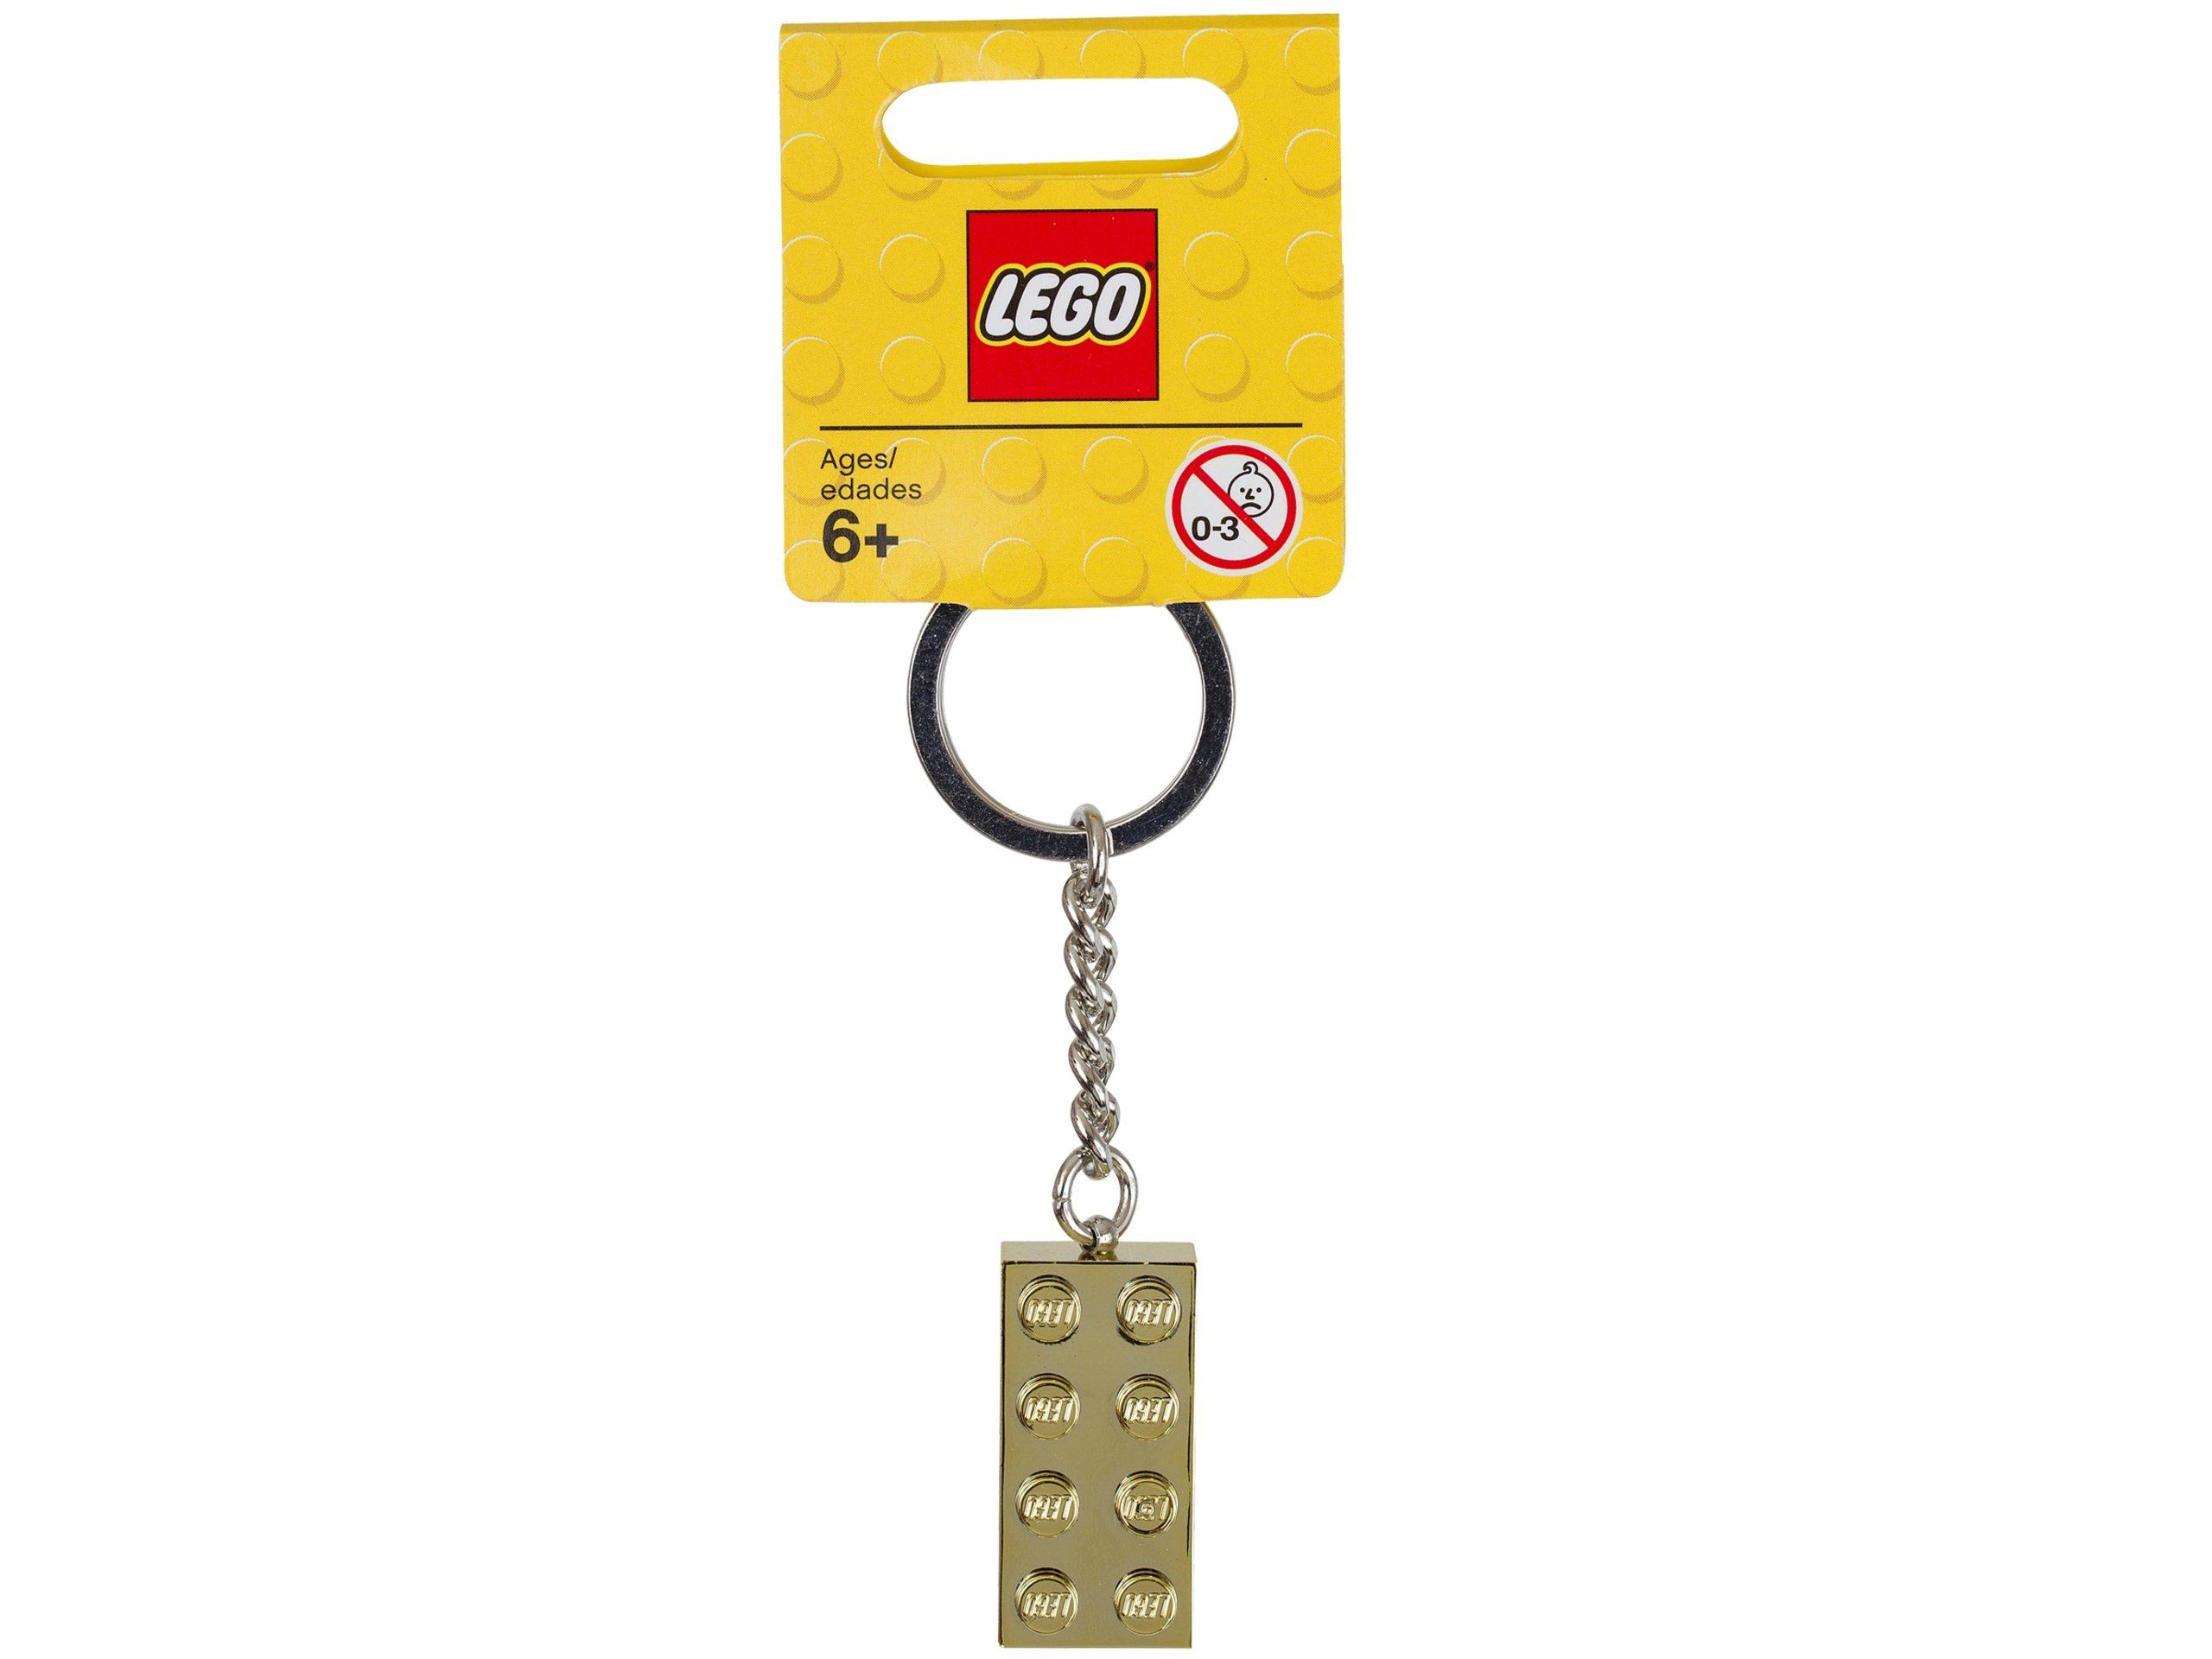 lego 850808 gold 2x4 stud key chain scaled